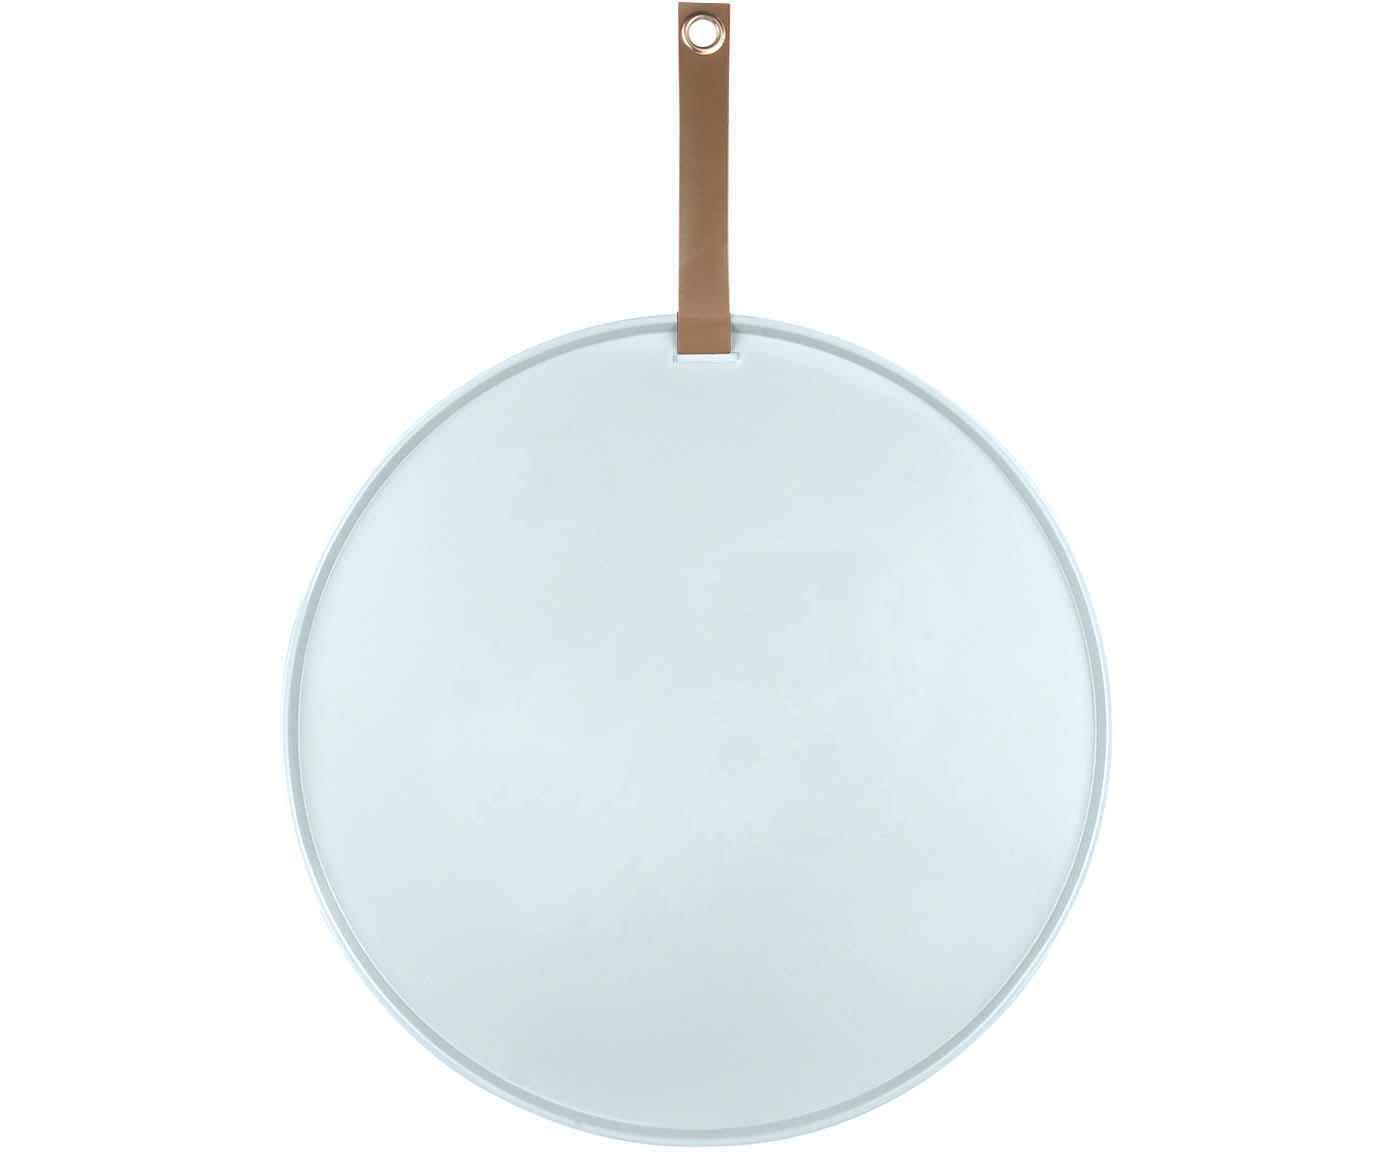 Tablero magnético Perky, Metal pintado, Azul claro, marrón, Ø 50 x F 1 cm